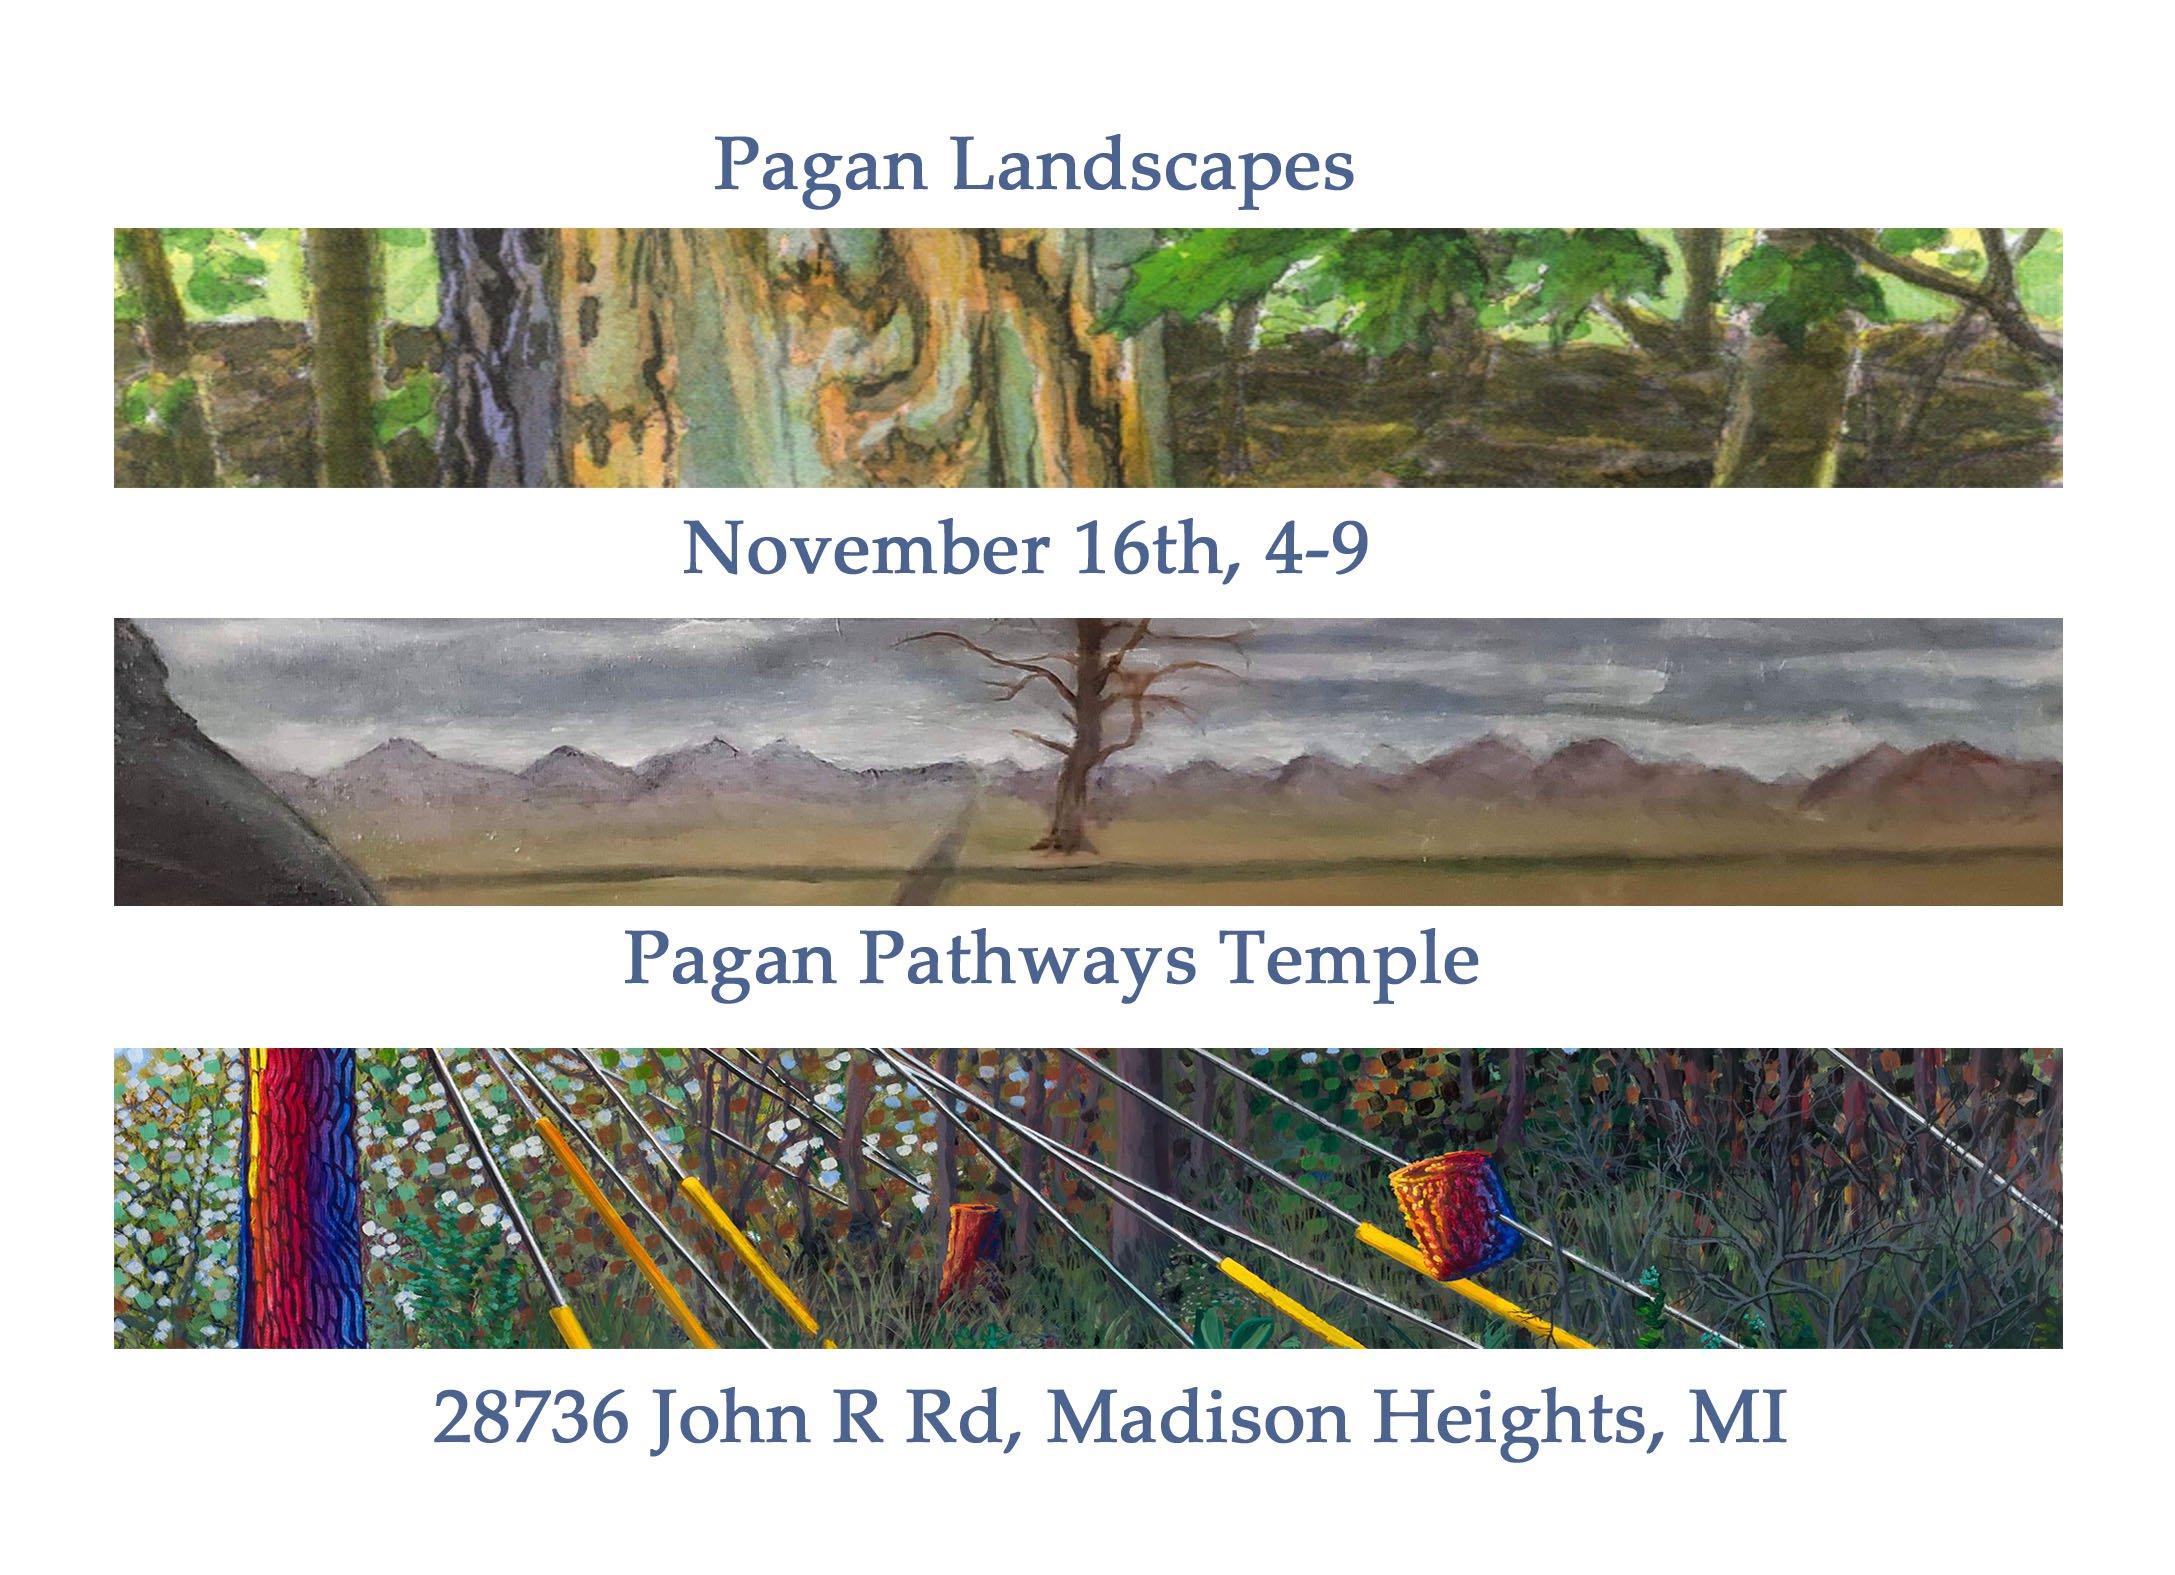 Pagan Landscapes